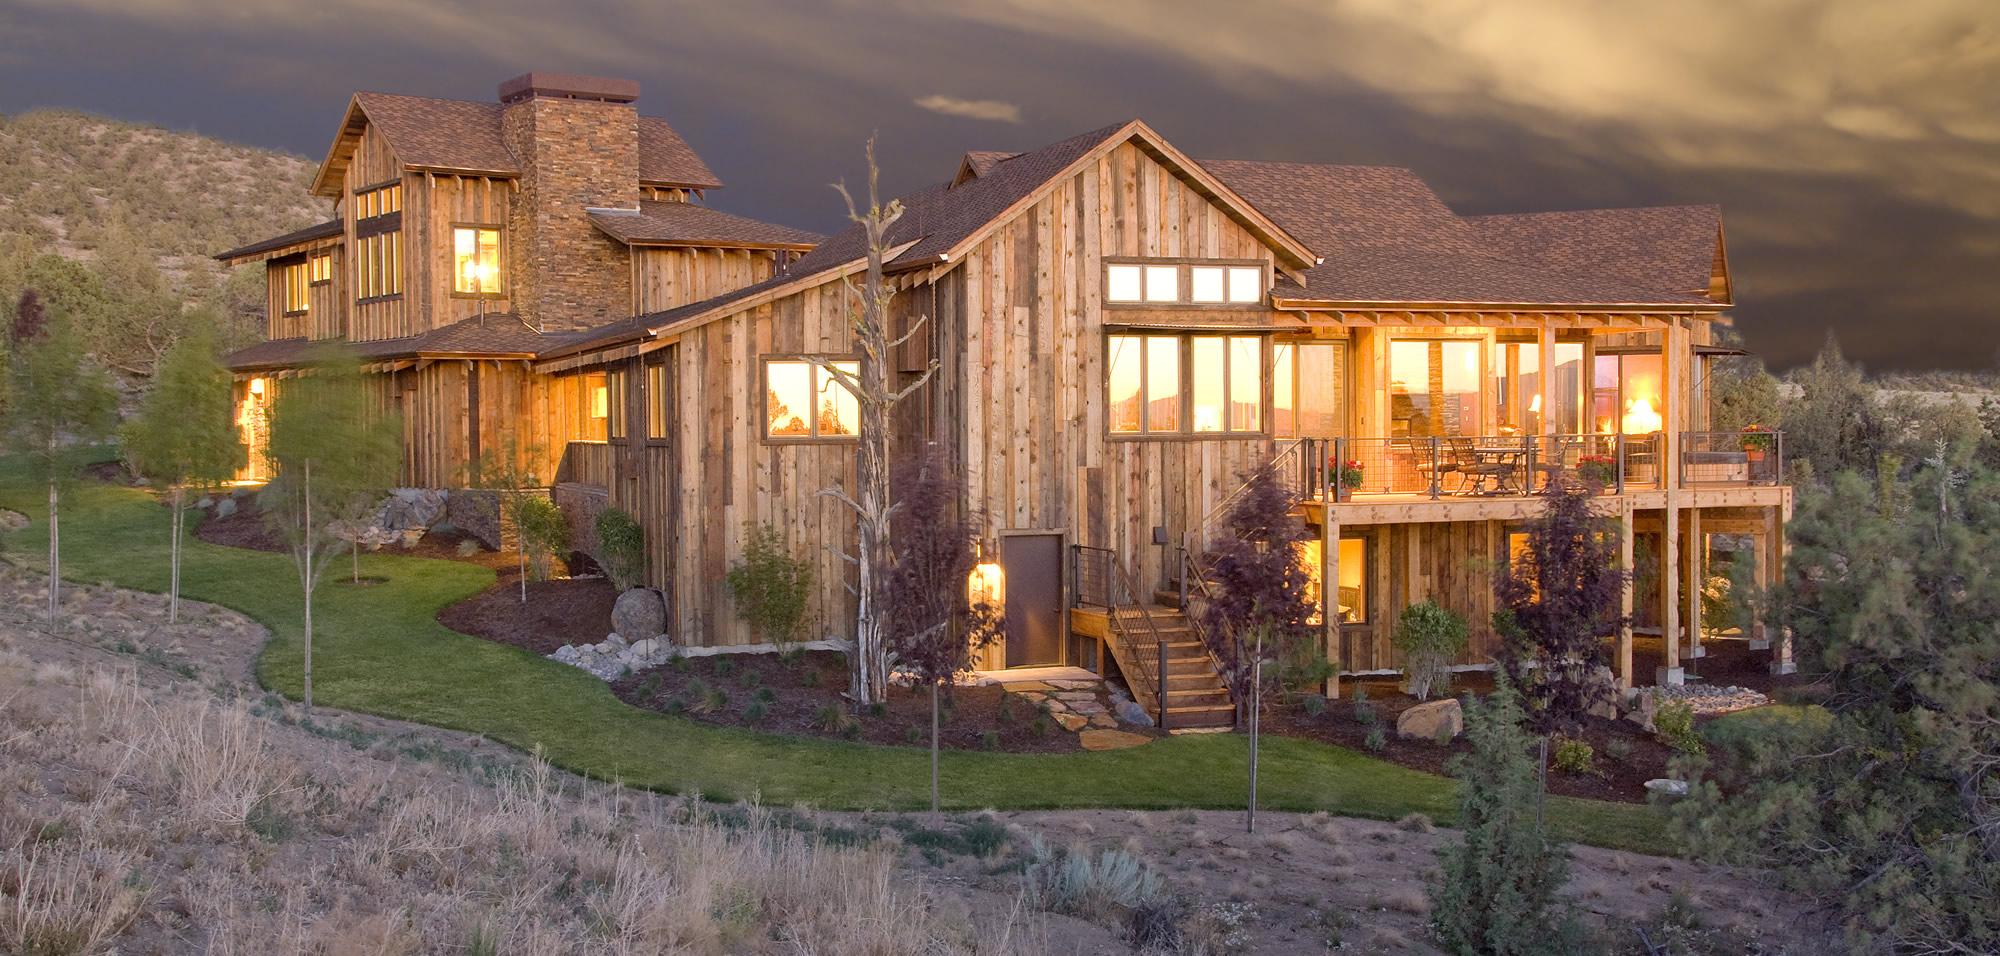 Central oregon home designers